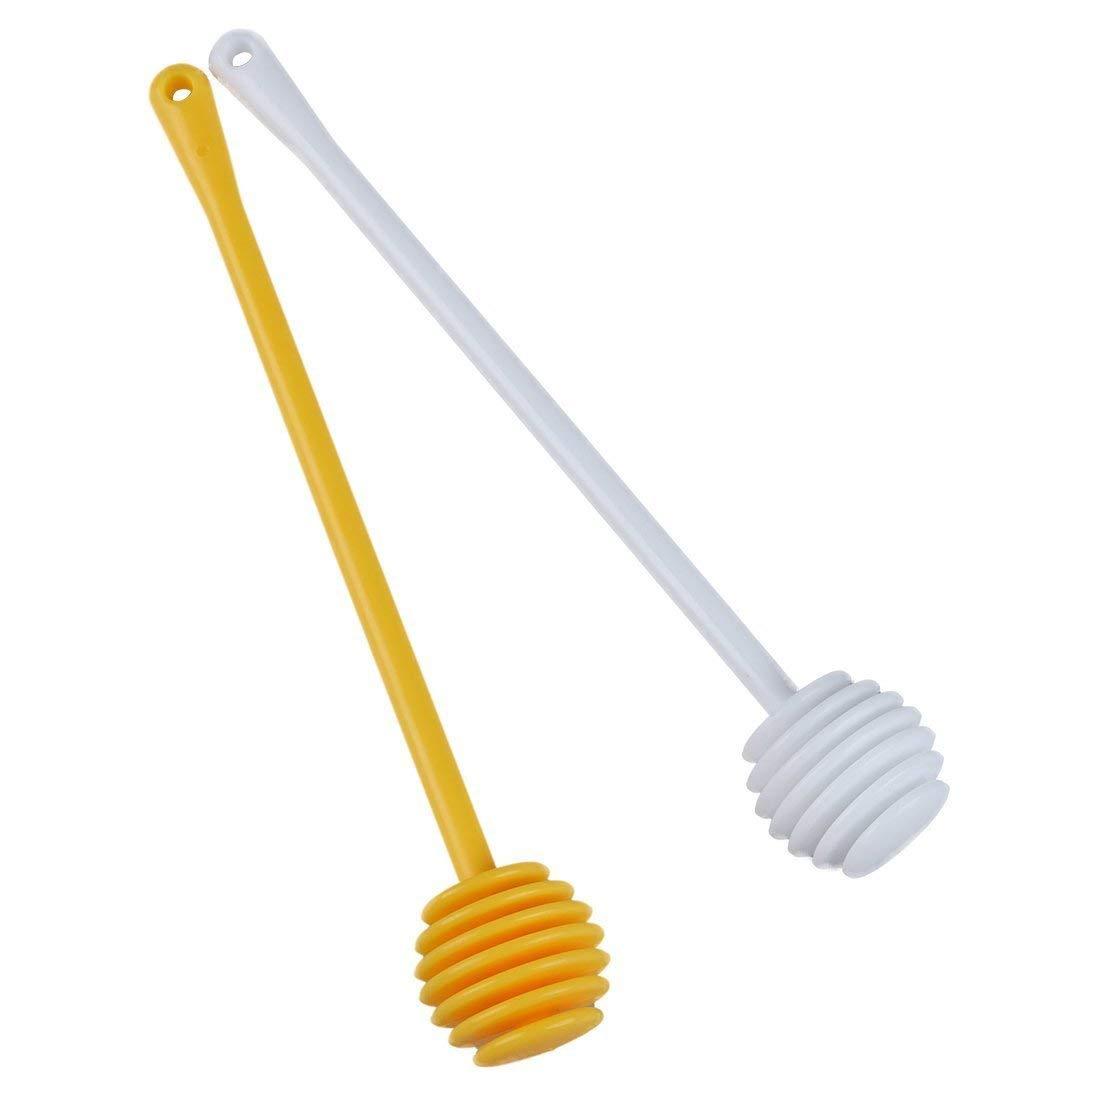 LUQUAN 2Pcs Honey Dipper Jam Stir Sticks Long Handle Yellow + White